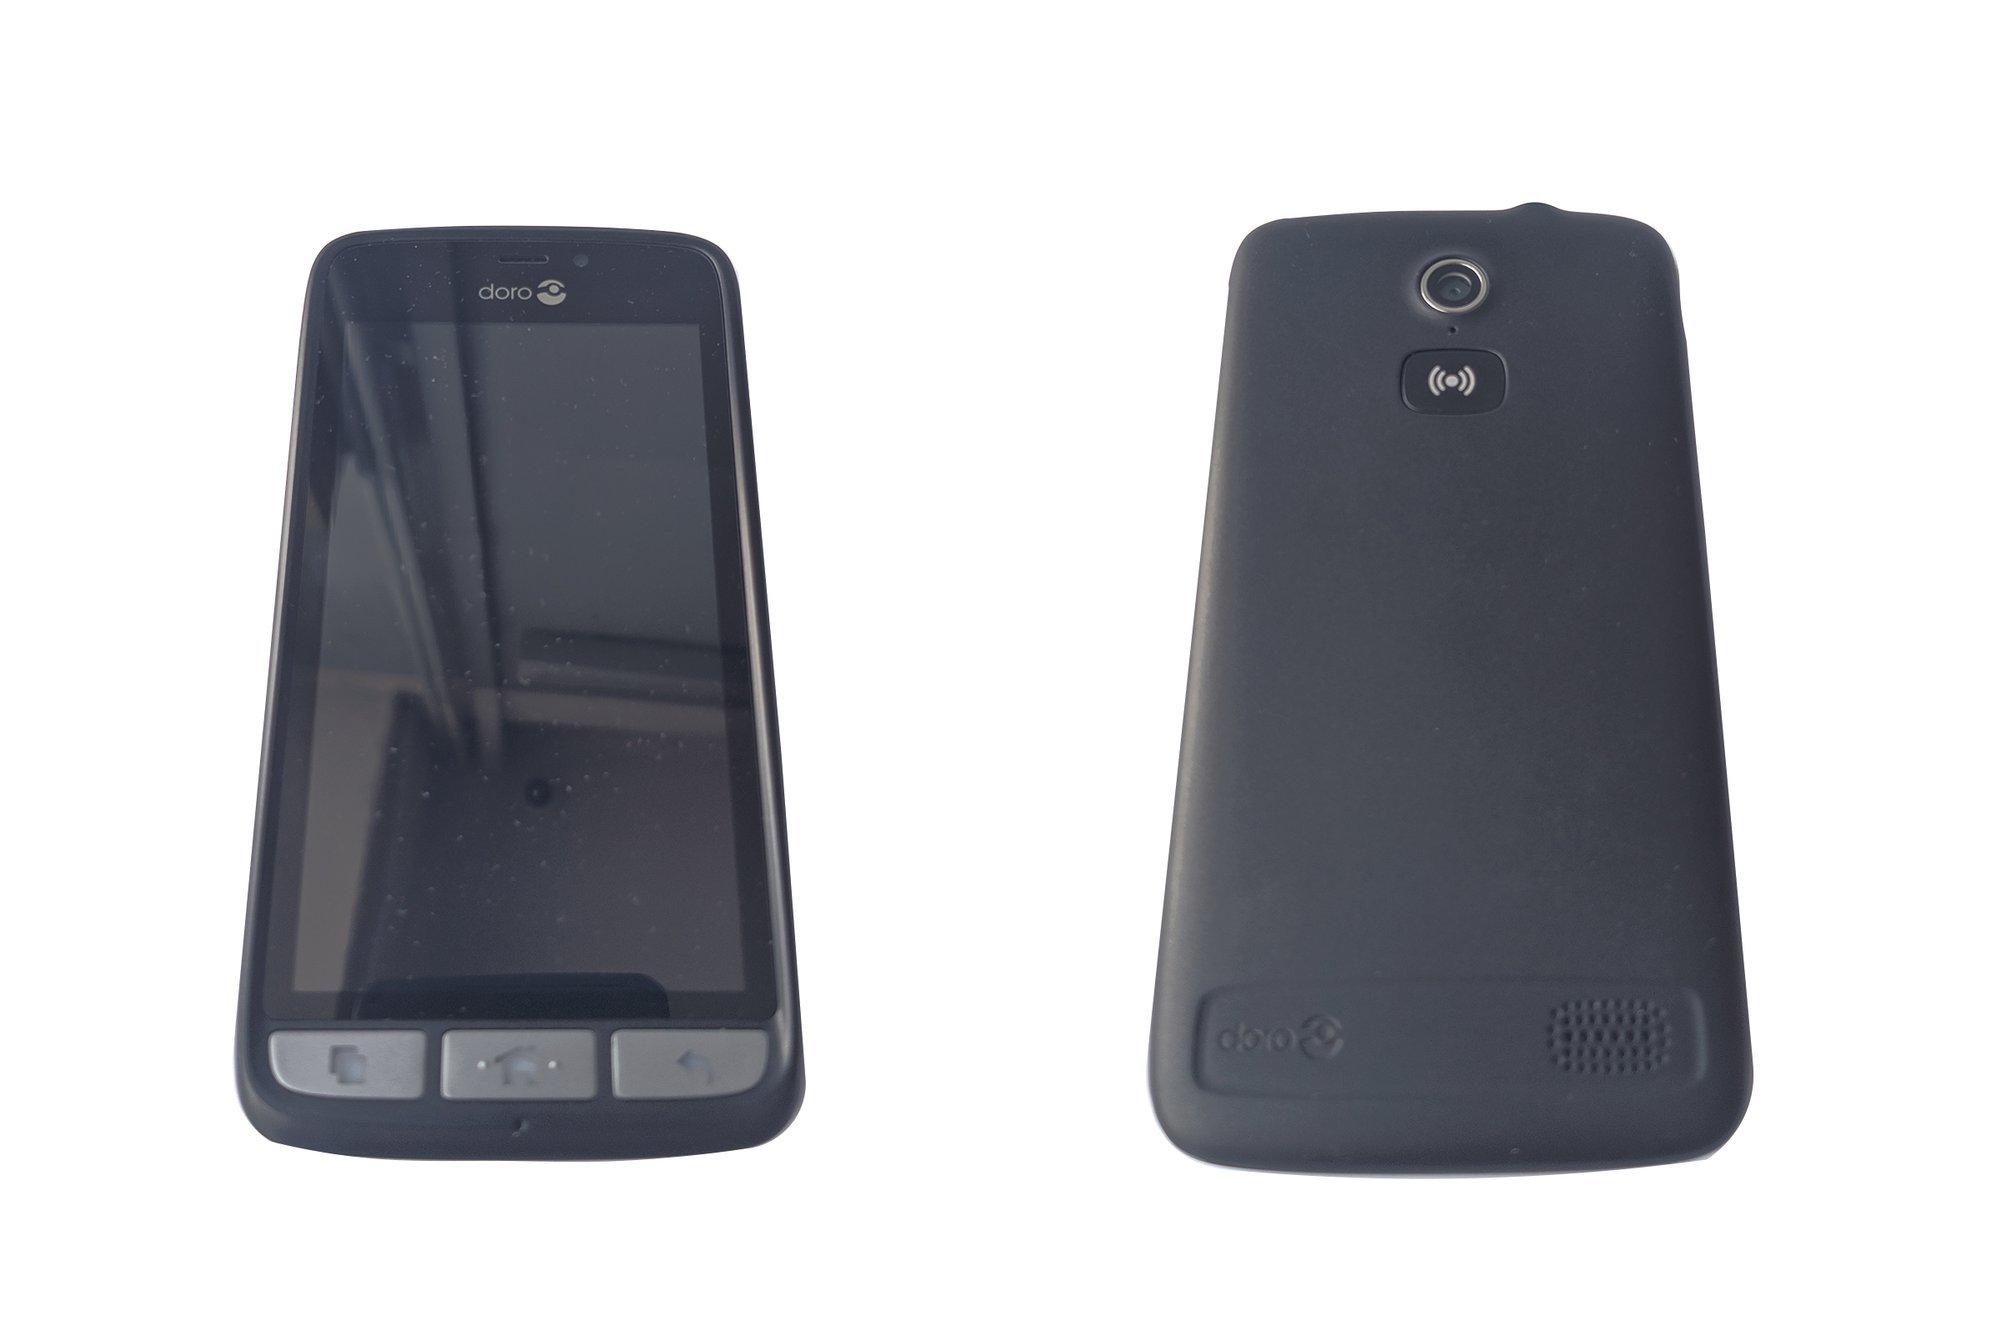 Smartphone Doro Liberto 8030 Steel Black DSB-0010 Damaged / Faulty